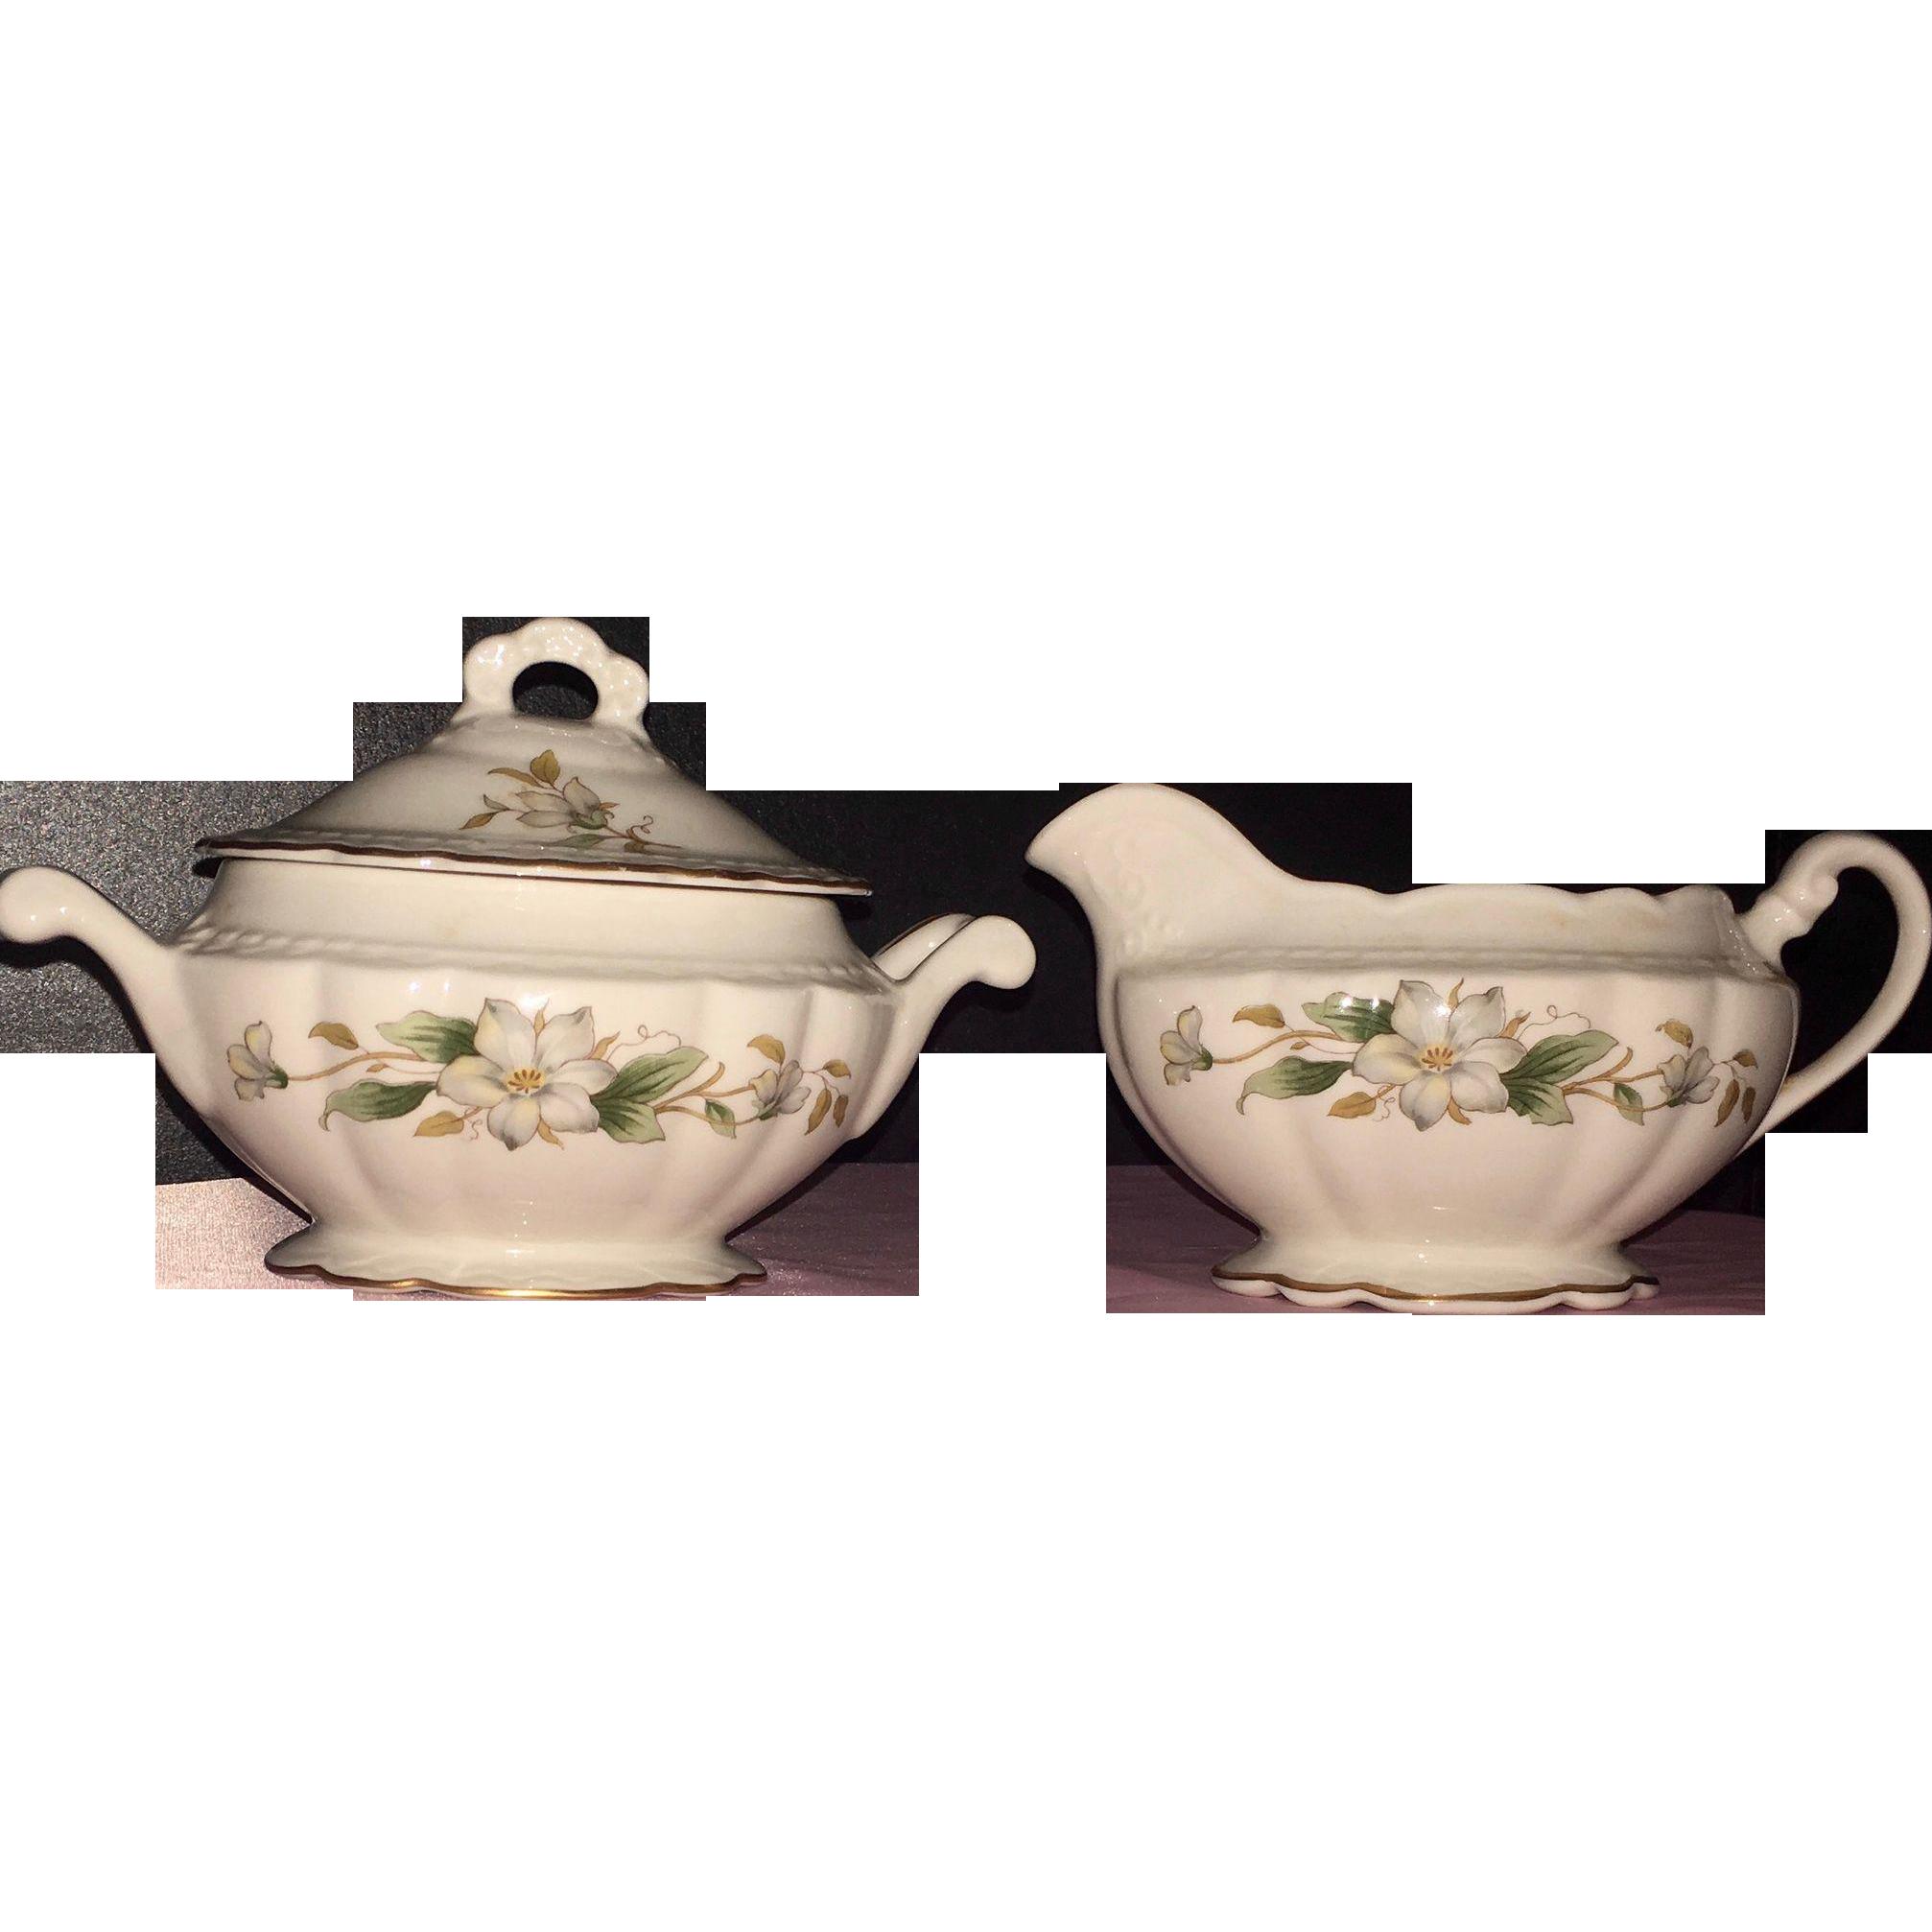 Vintage Covered Sugar Bowl with Creamer Embassy USA Vitrified China